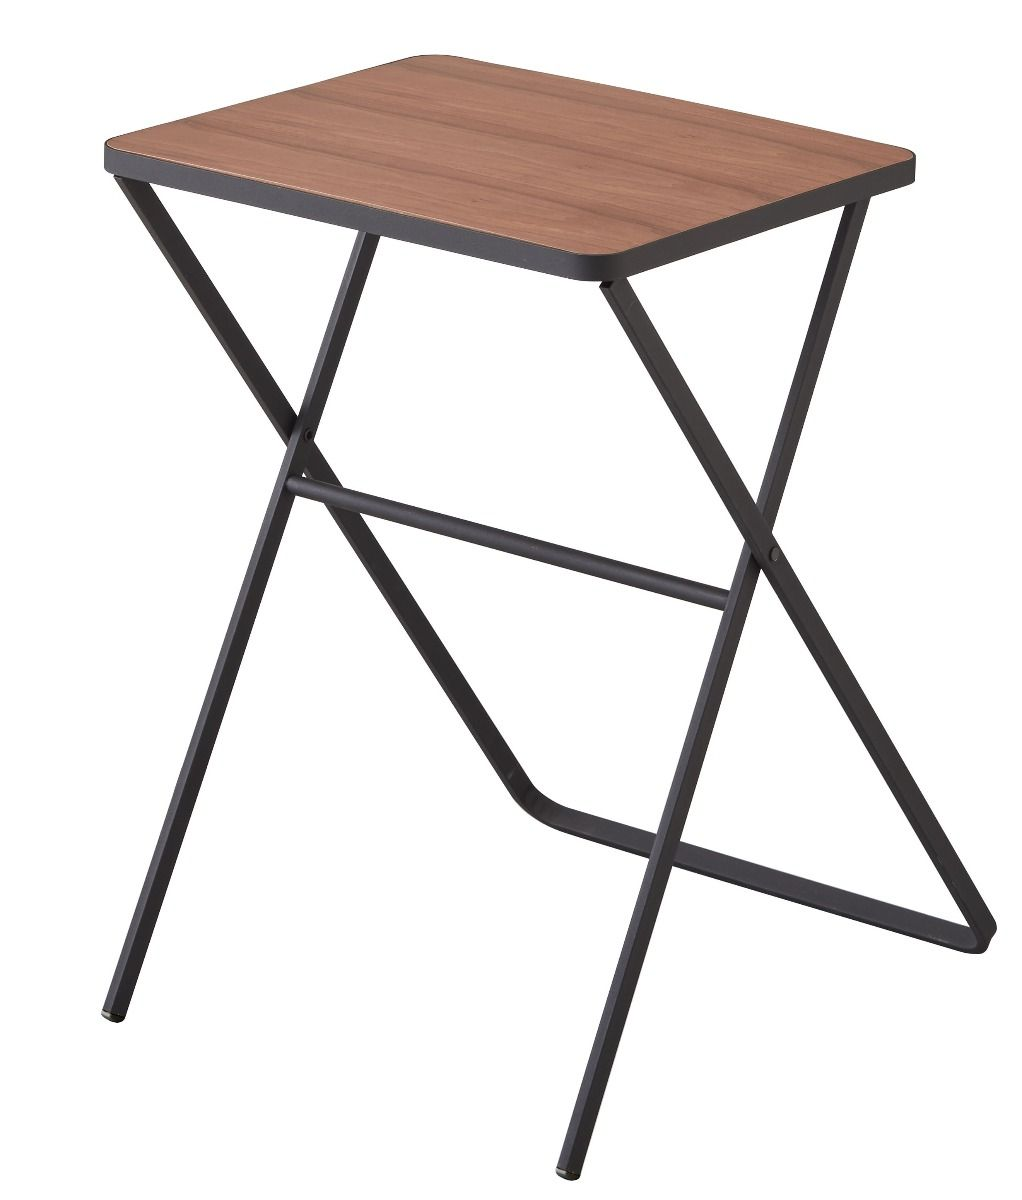 tower 折り畳みテーブル ブラック